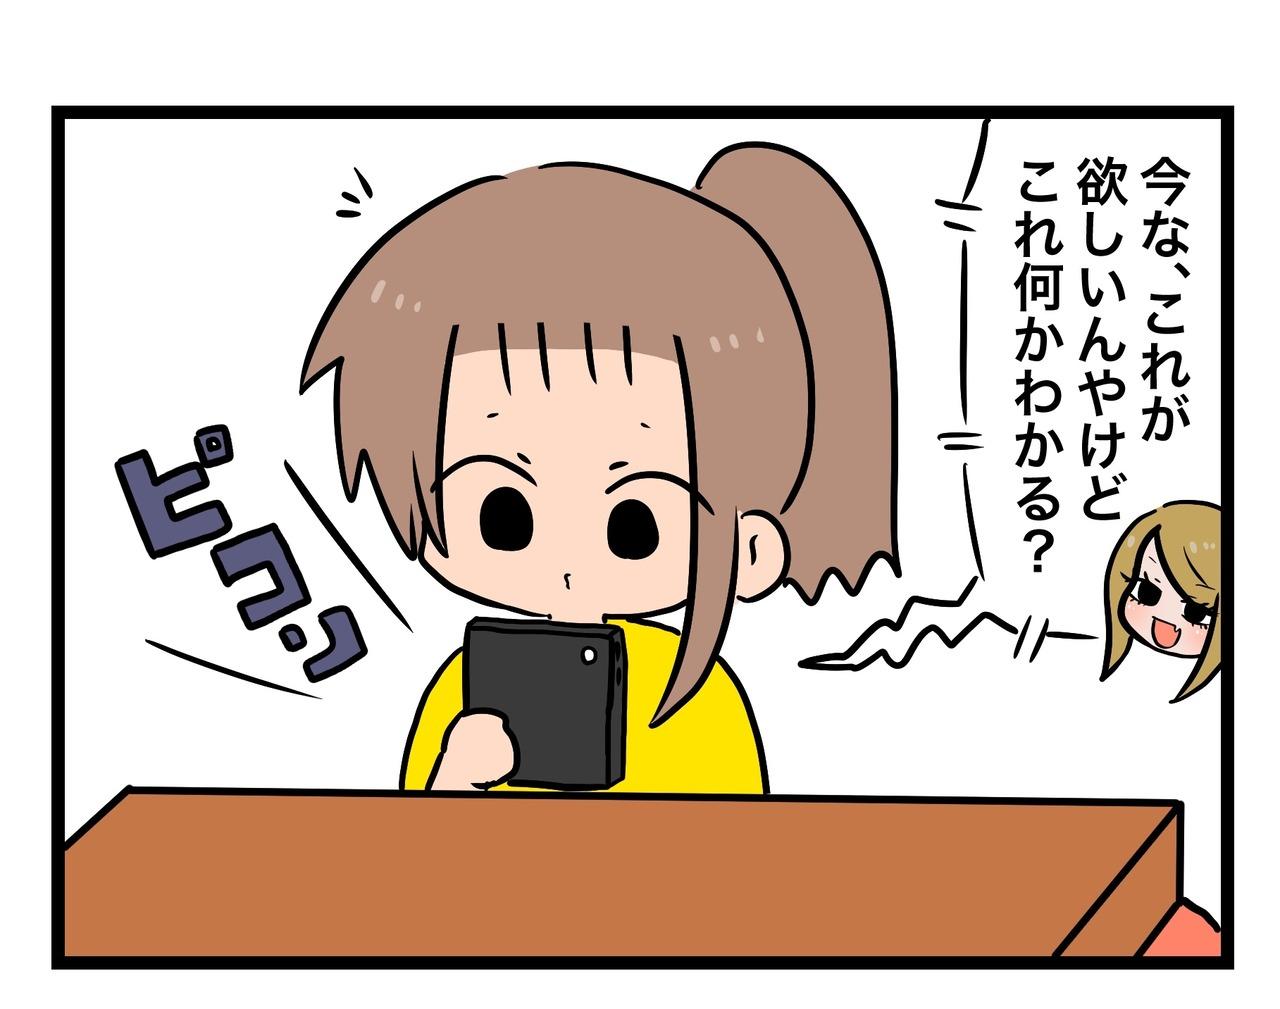 7C03B2DC-96EF-46BB-8904-8720AA160A4E